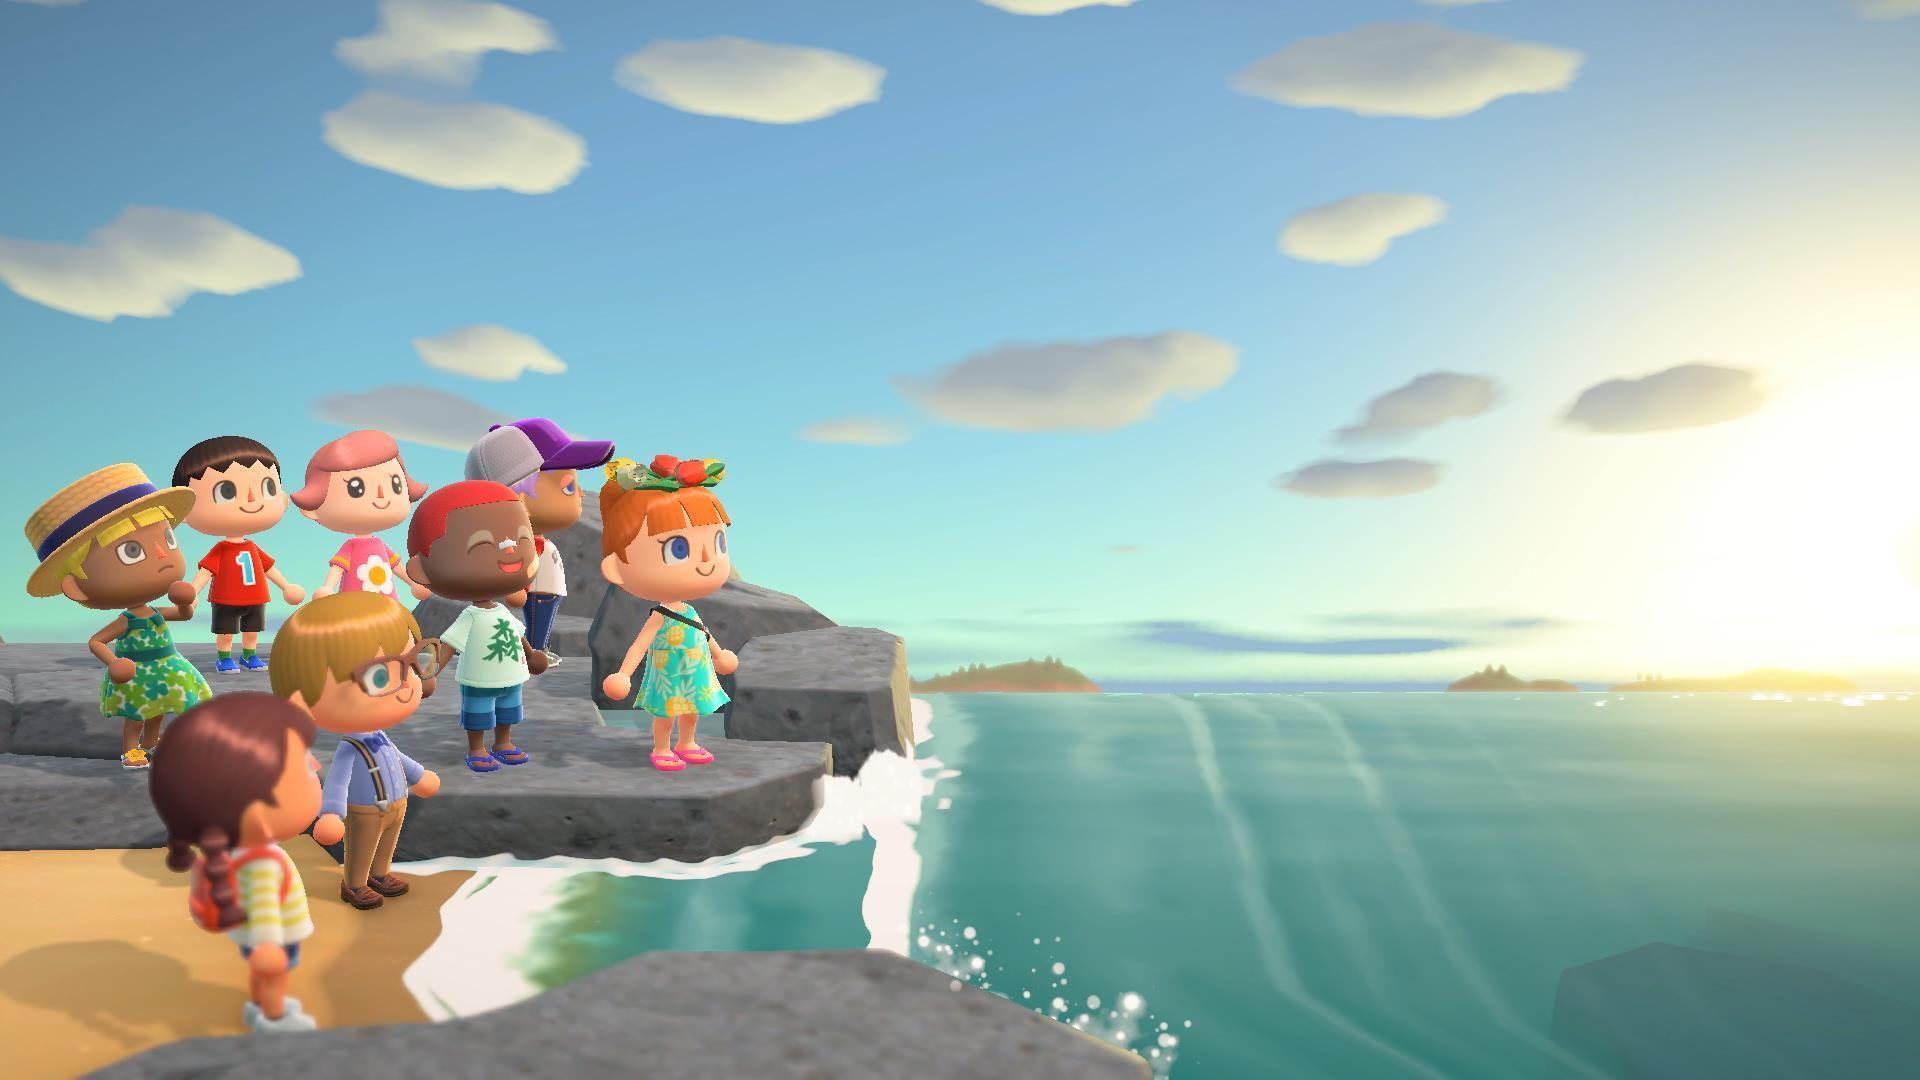 Animal Crossing New Horizons Wallpapers Top Free Animal Crossing New Horizons Backgrounds Wallpaperaccess